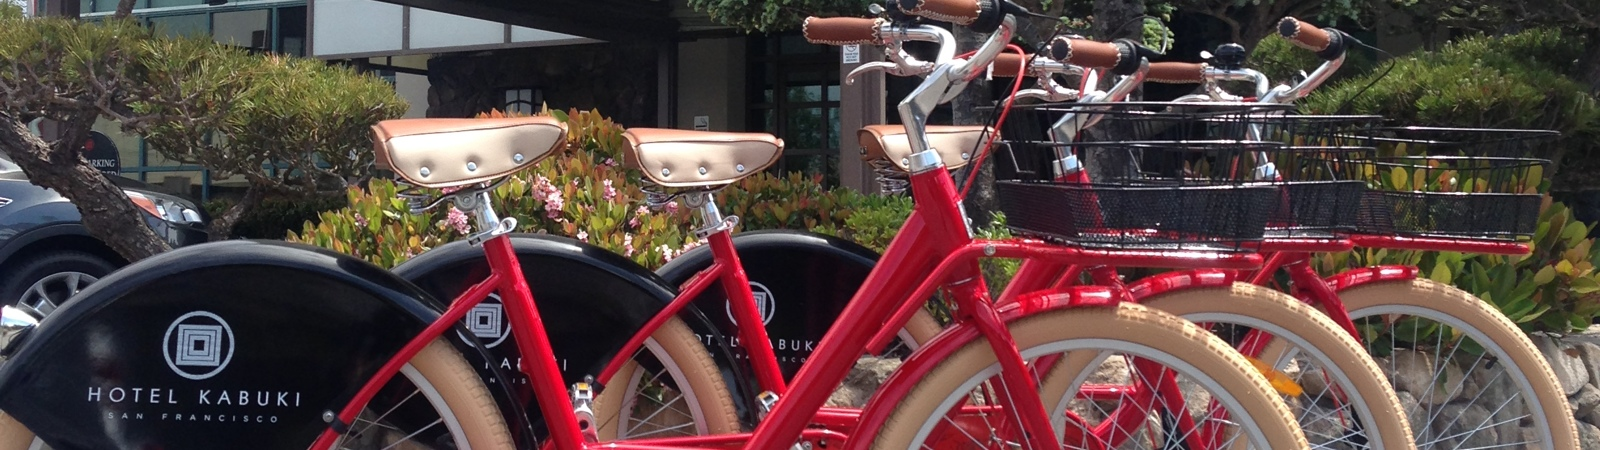 Hotel Kabuki Bike Rentals